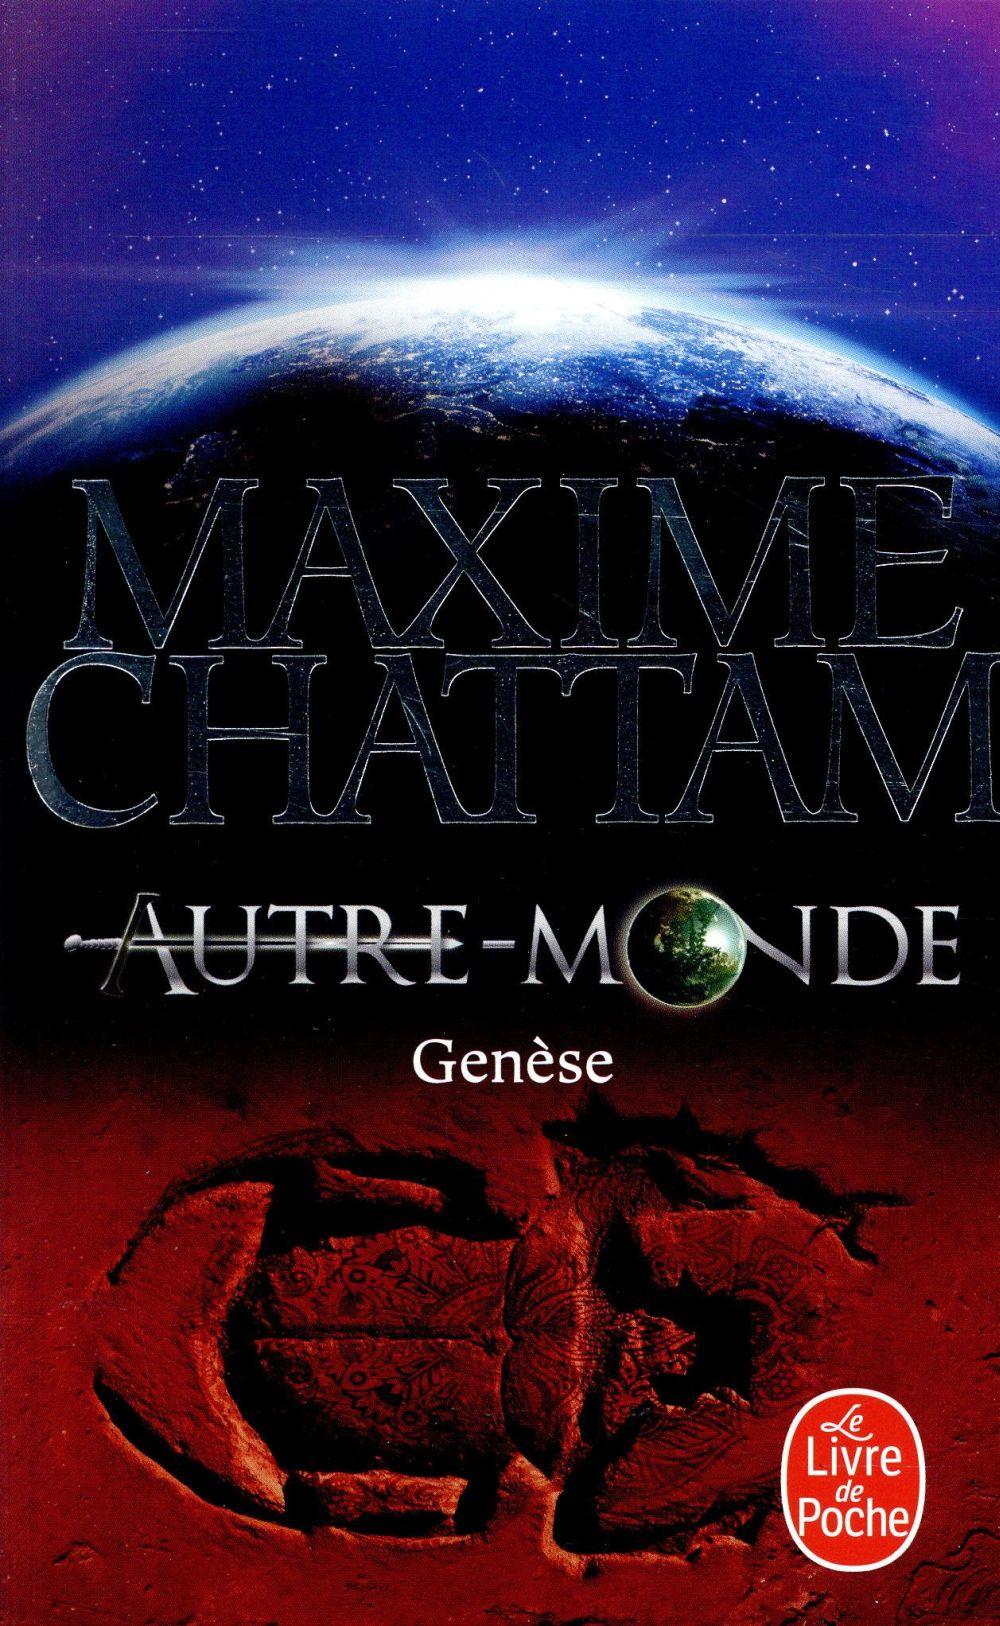 GENESE (AUTRE-MONDE, TOME 7) CHATTAM MAXIME Lgdj